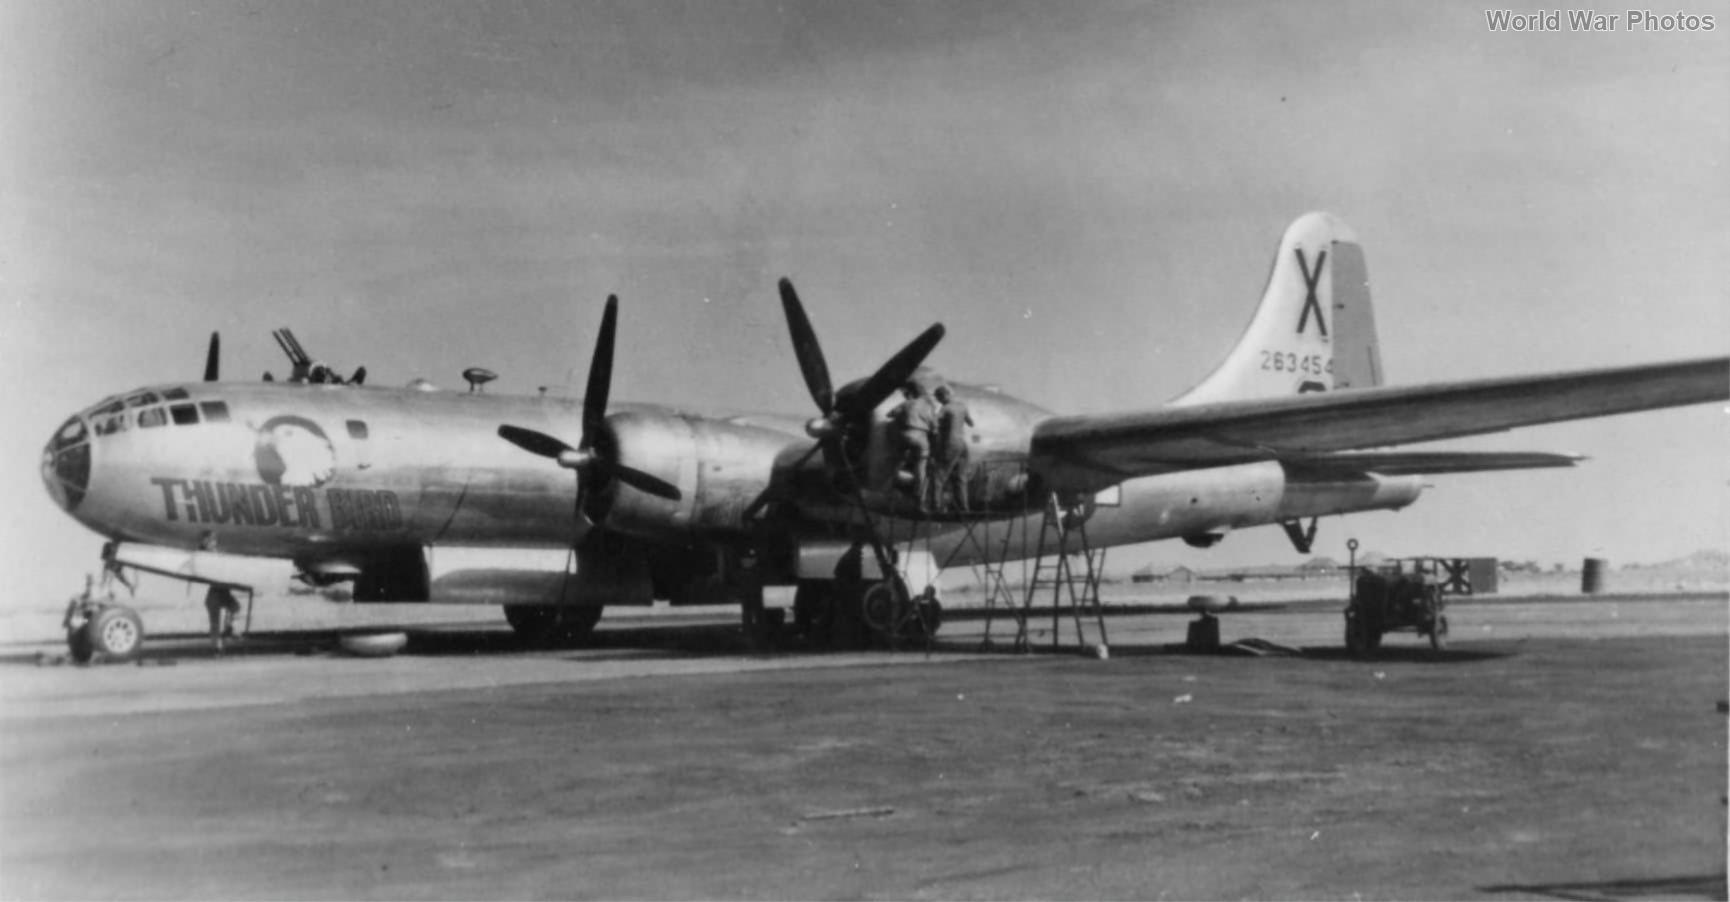 B-29 42-63454 Thunder Bird of the 462nd BG